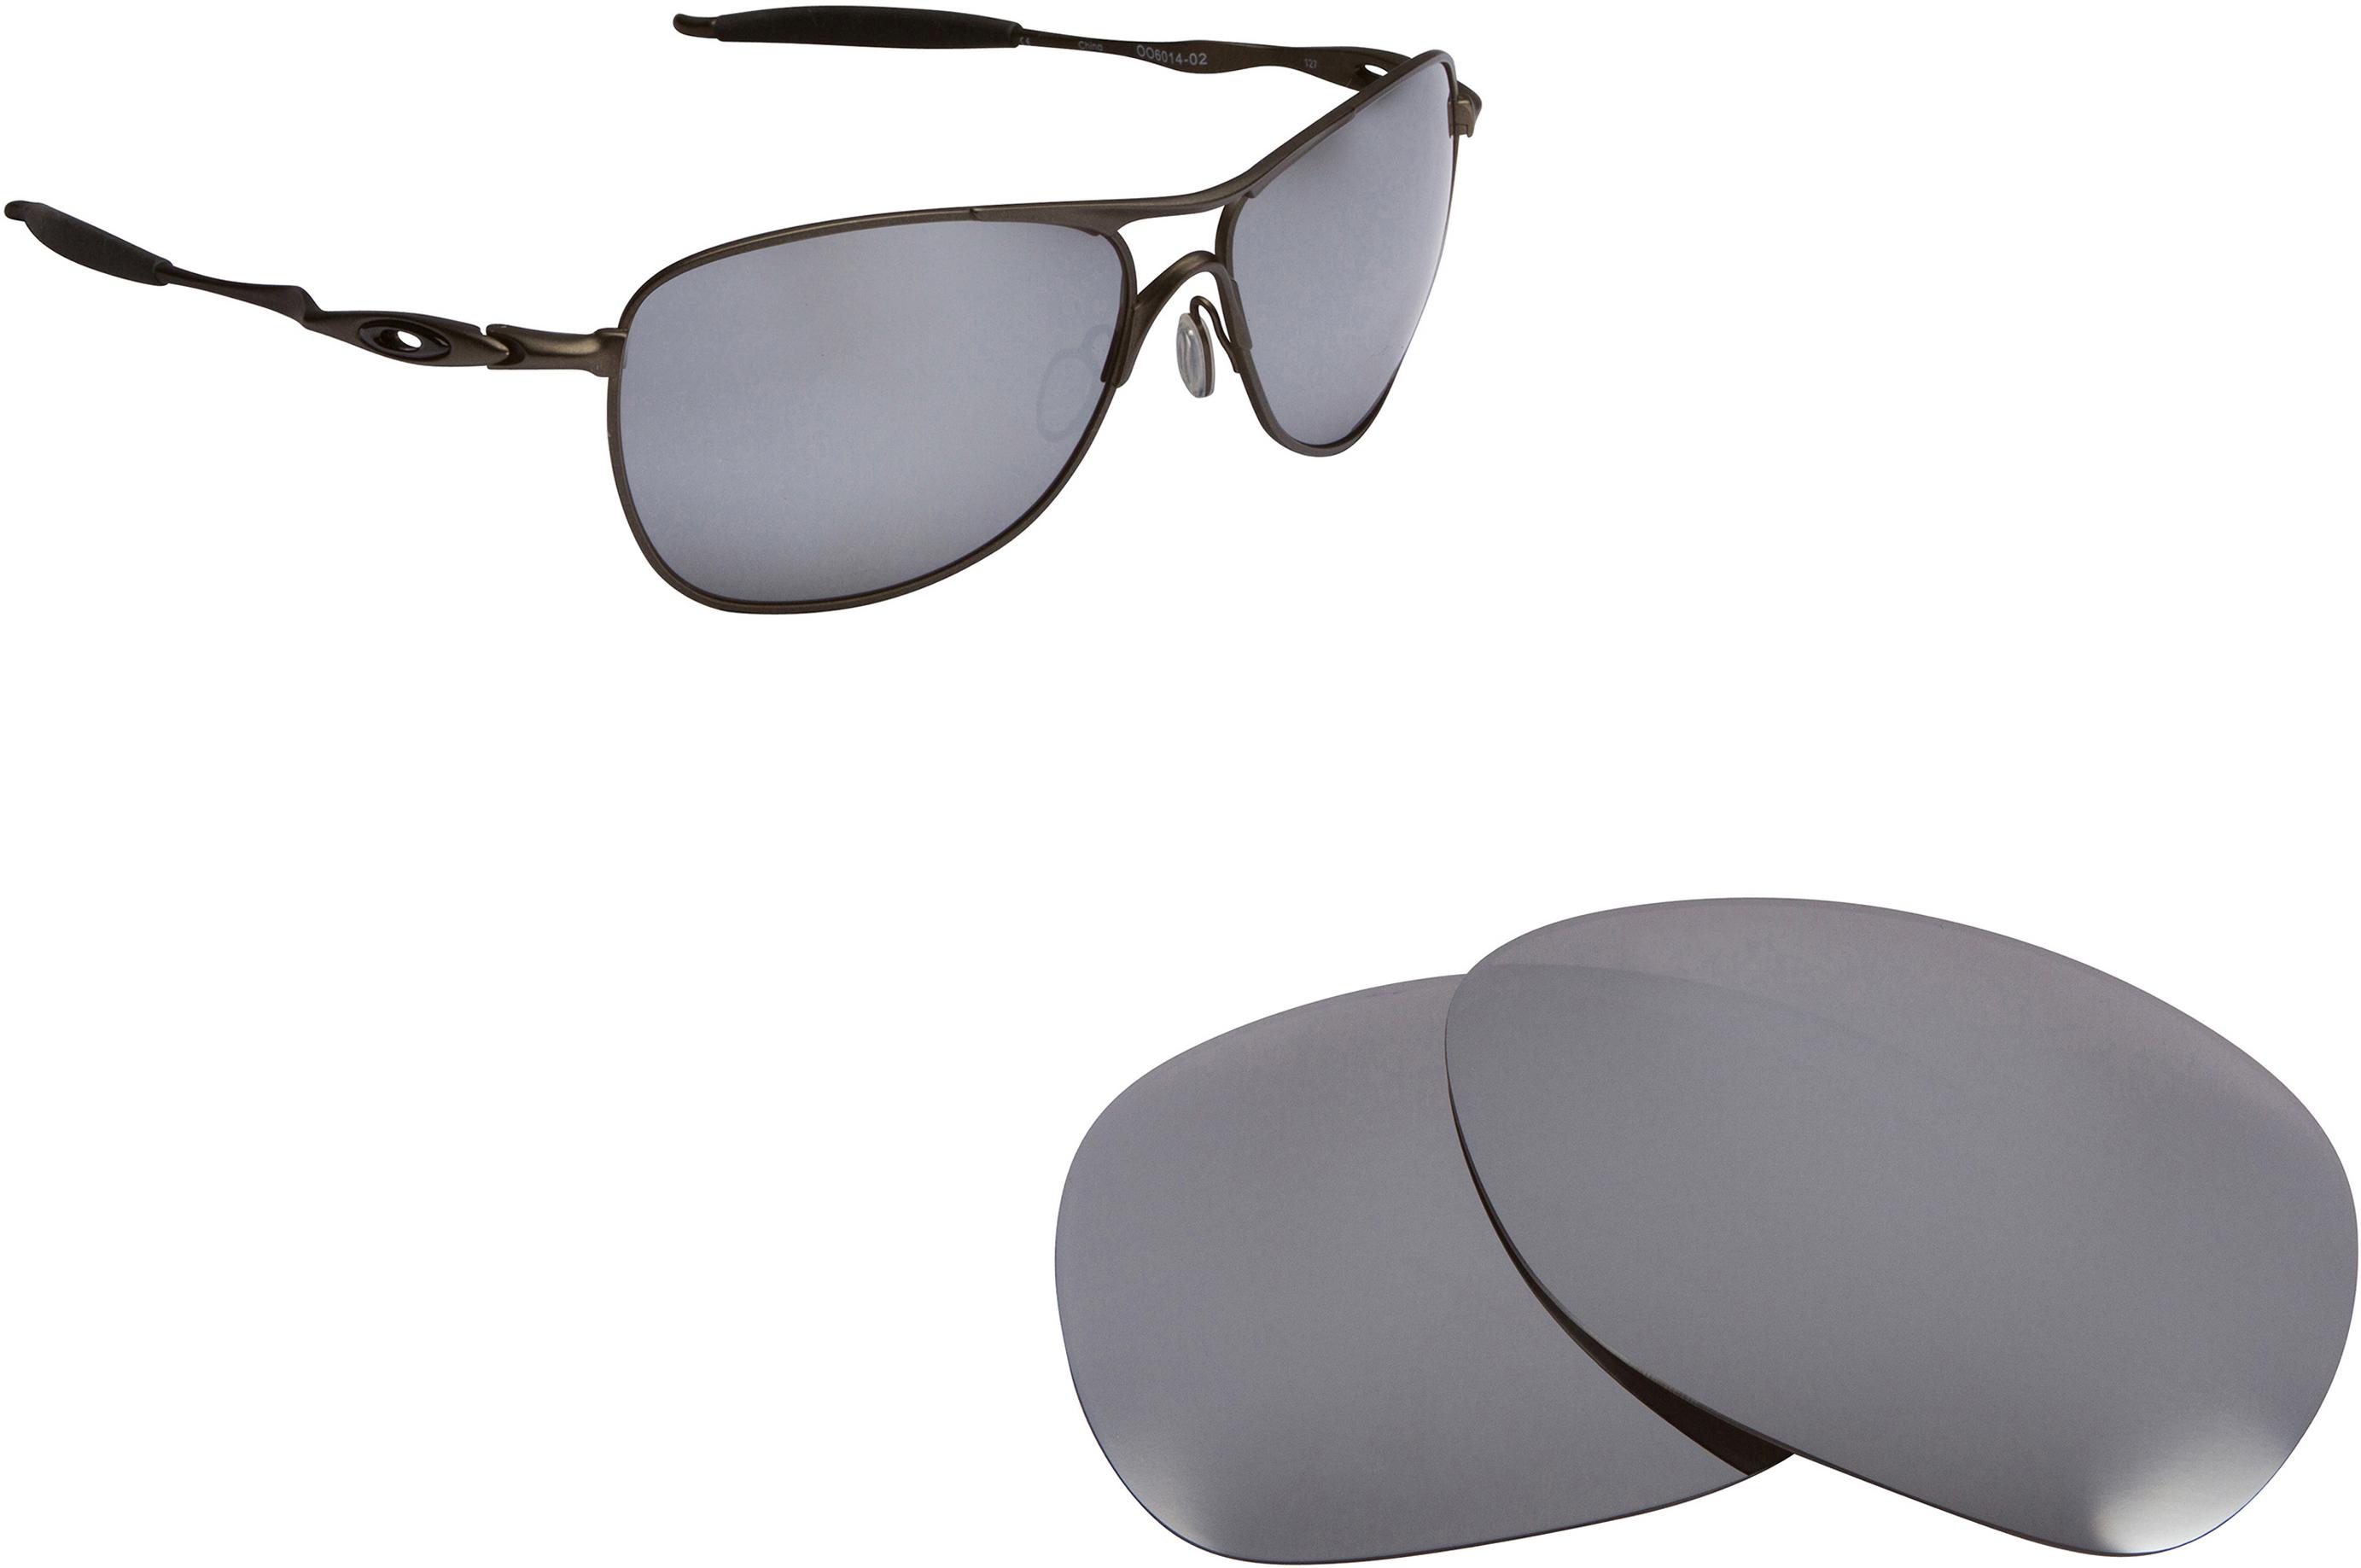 92401c86d3 Oakley Crosshair 2.0 Polarized Mirror Sunglasses « Heritage Malta